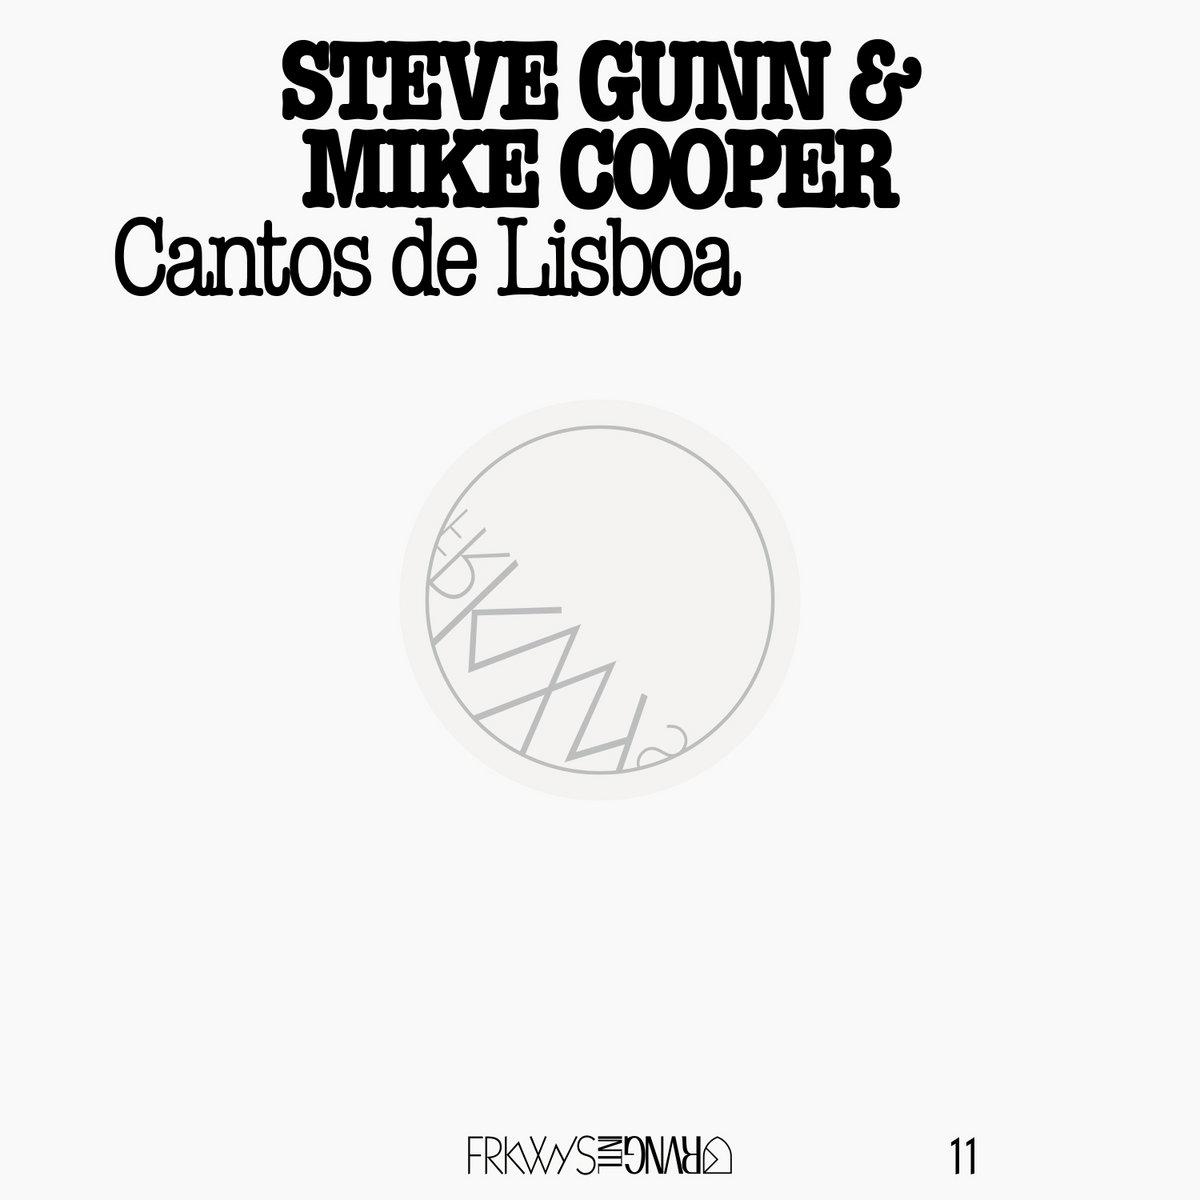 FRKWYS Vol. 11: Steve Gunn & Mike Cooper - Cantos de Lisboa | RVNGIntl.